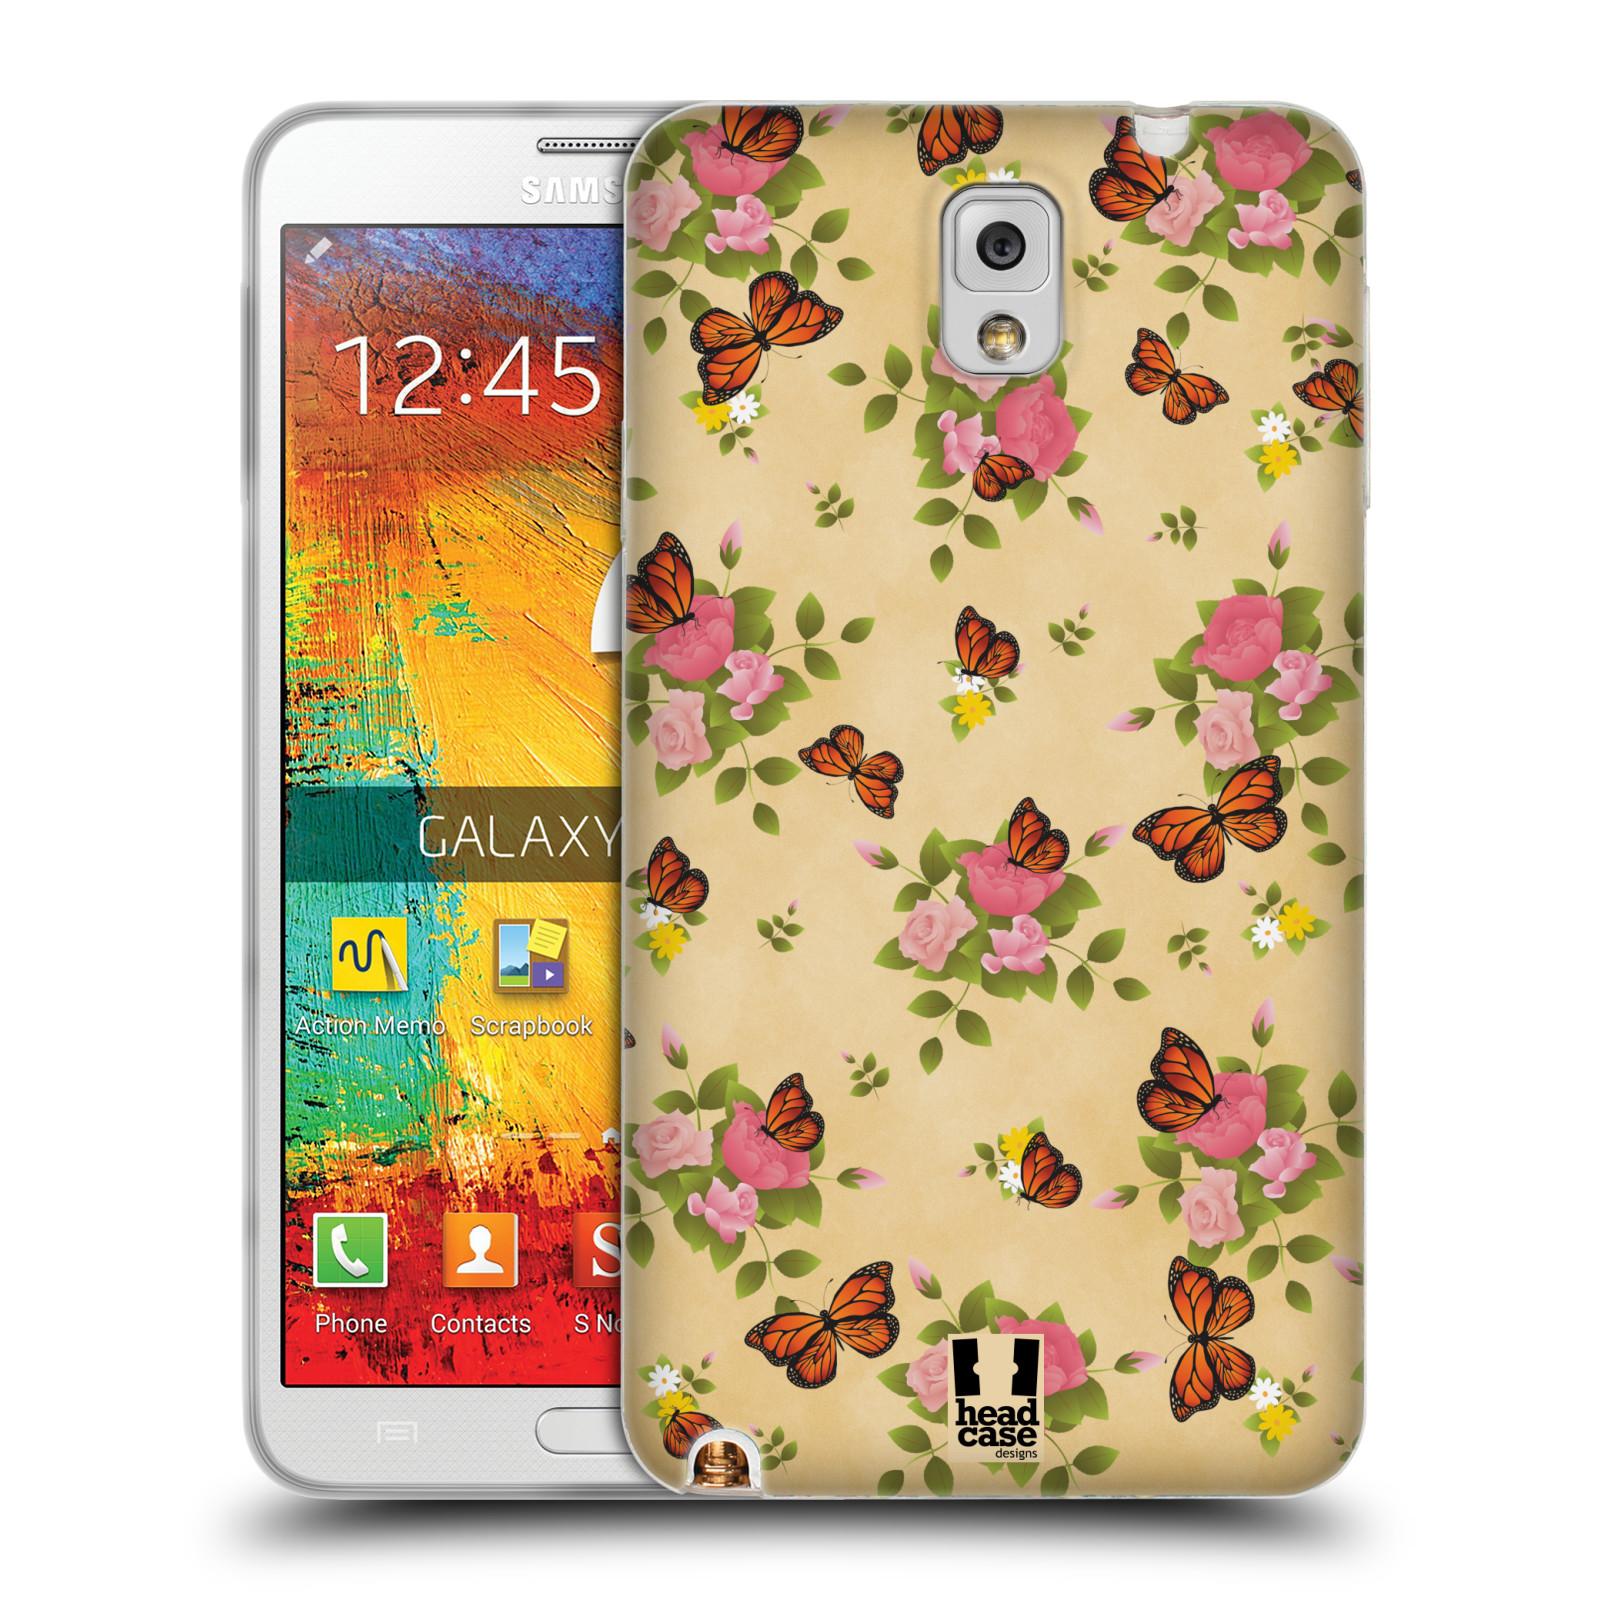 HEAD-CASE-DESIGNS-MONARCH-BUTTERFLY-PRINTS-SOFT-GEL-CASE-FOR-SAMSUNG-PHONES-2